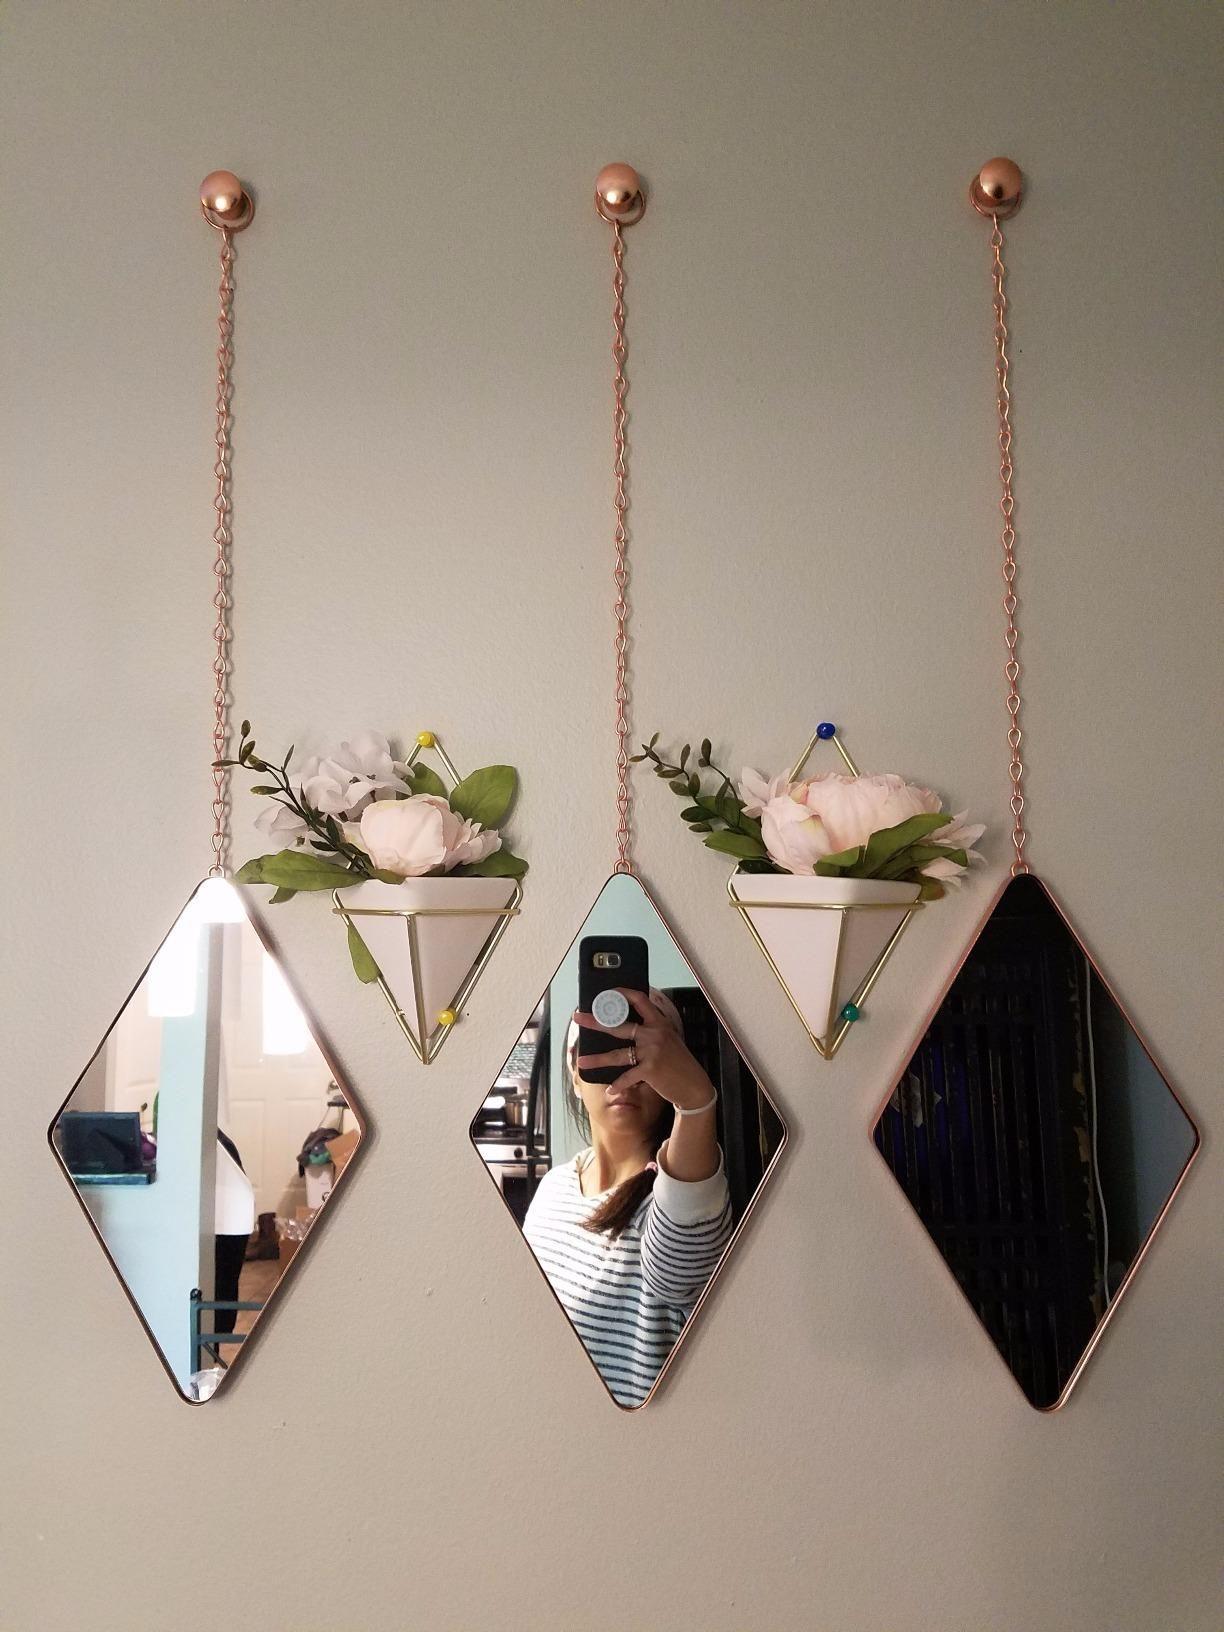 Amazon: Umbra Trigg Hanging Planter Vase Geometric Wall Inside Trigg Ceramic Planter Wall Decor (View 2 of 30)